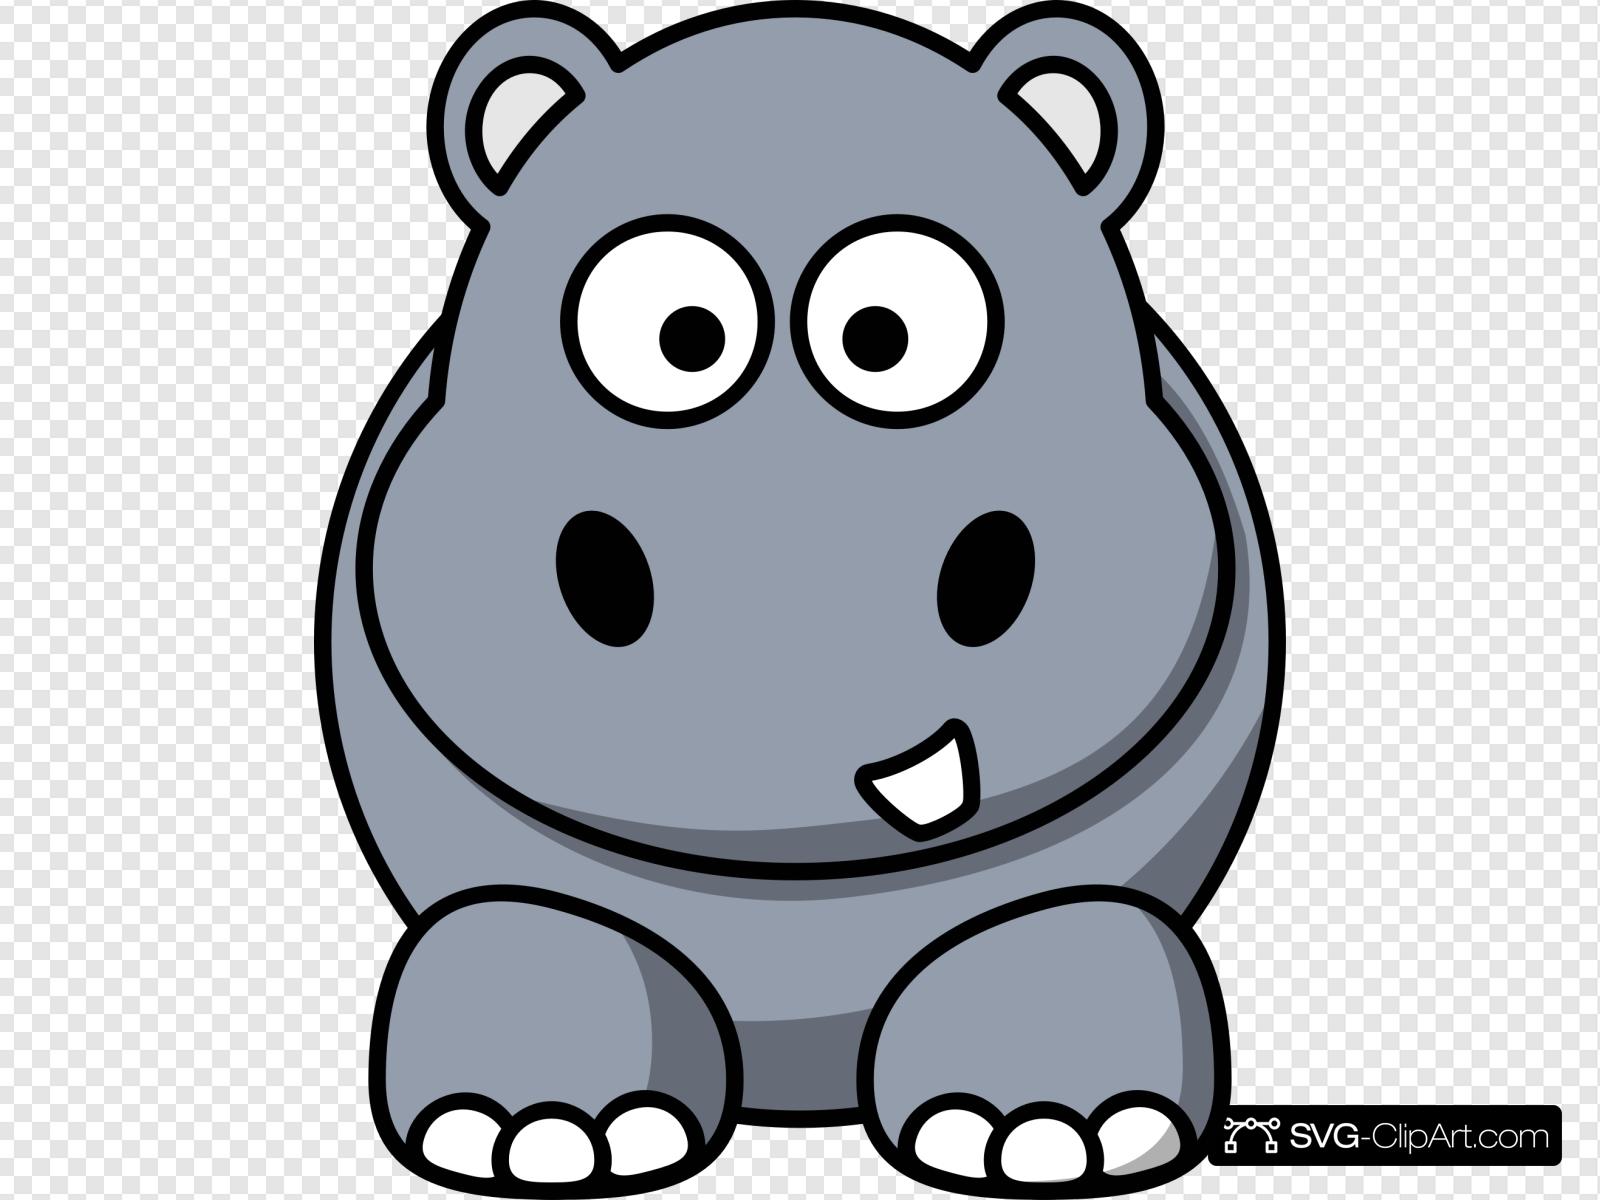 Clipart hippo simple. Cartoon clip art icon